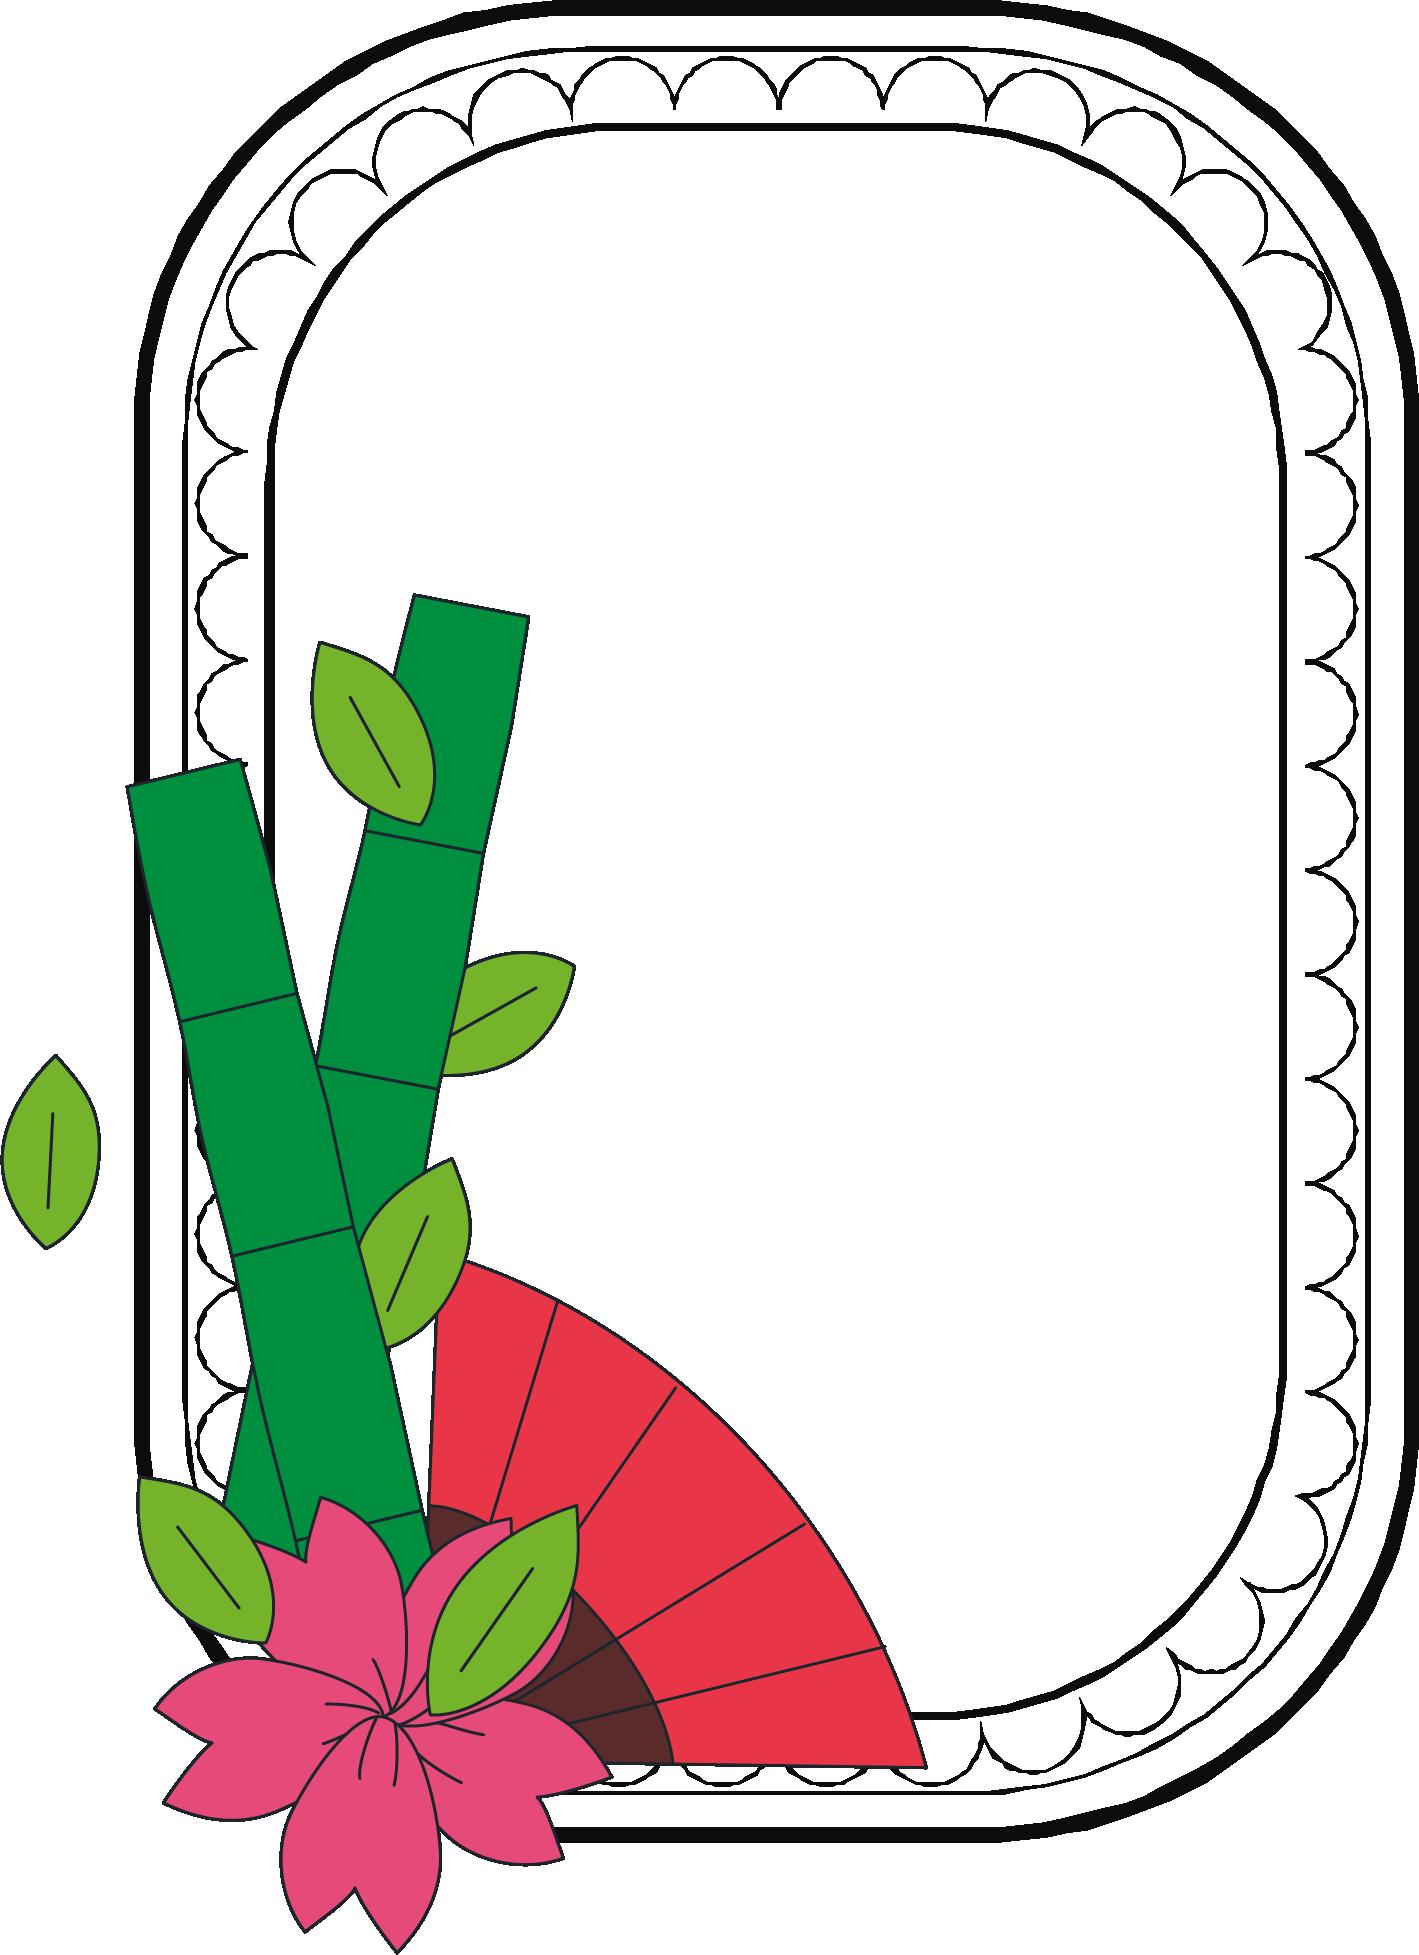 Adobe Illustrator Clip Art - Adobe Illustrator Clip Art (1419x1955)